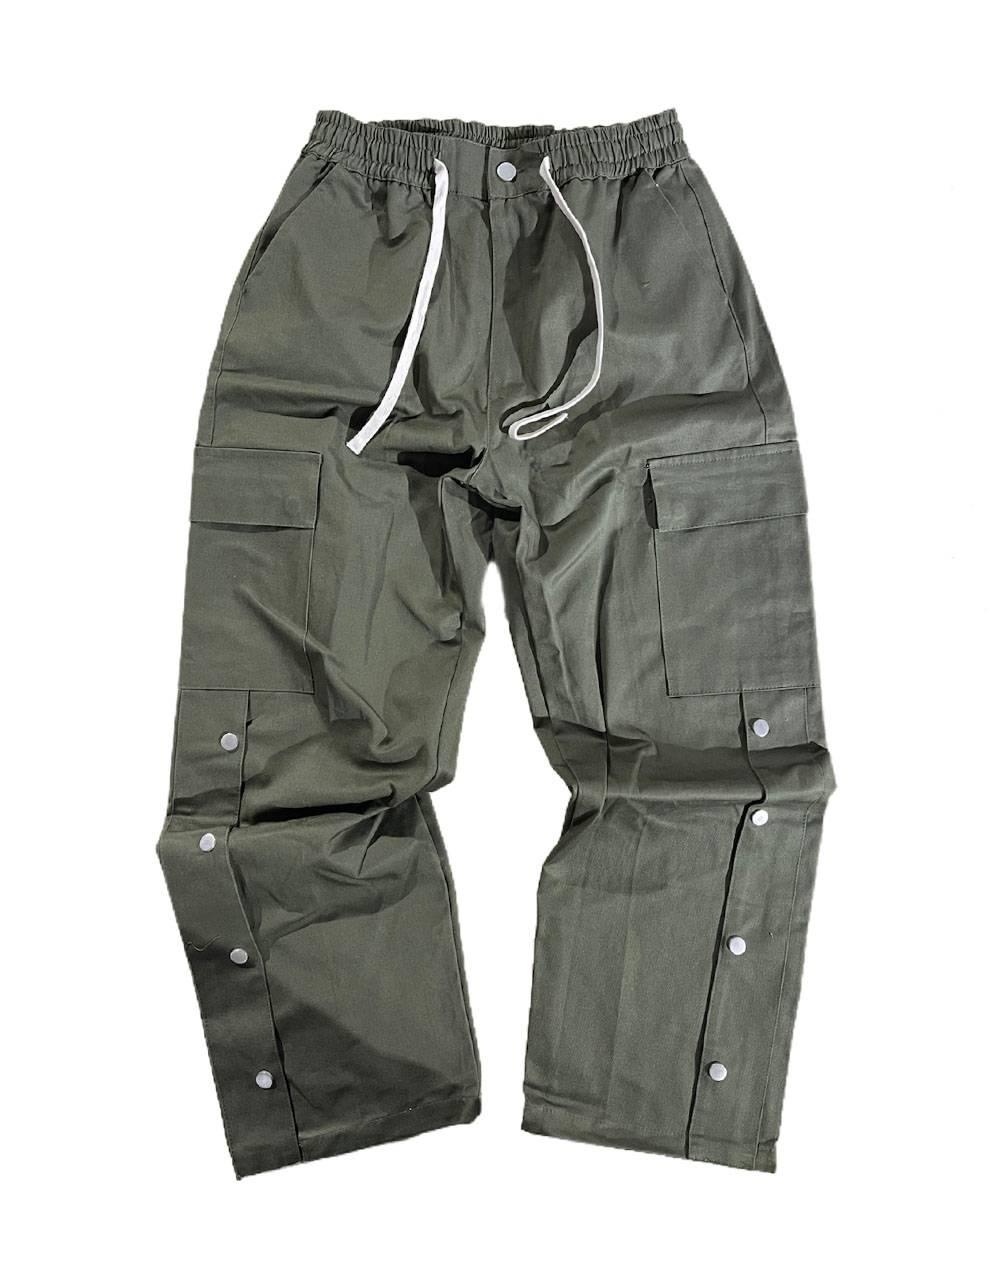 Volk sick mind work pants - army VOLK Pant 97,54€